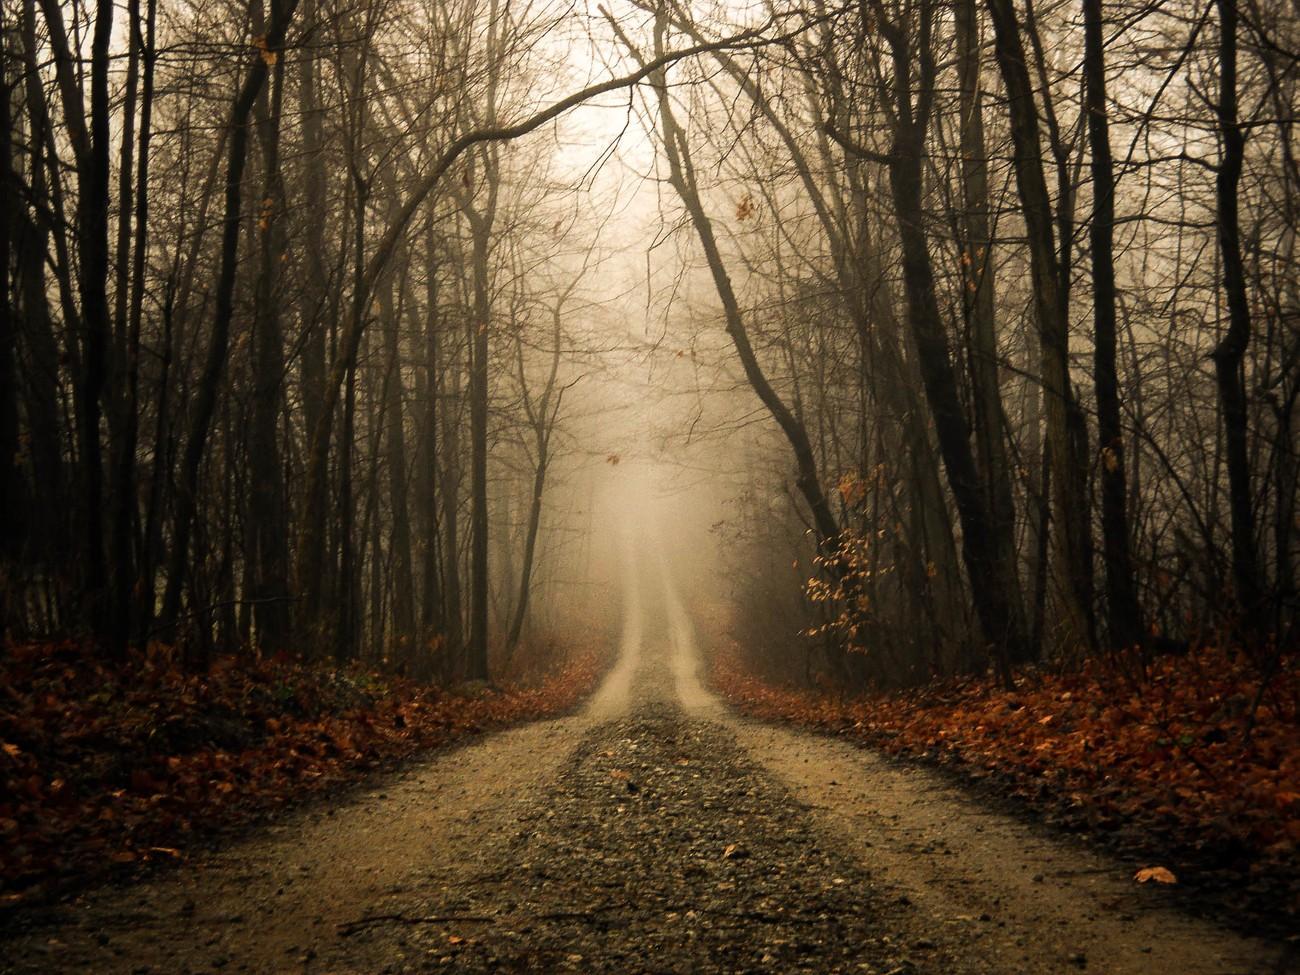 Foggy Fall Wallpaper 300 Empty Roads Photo Contest Winners Blog Viewbug Com